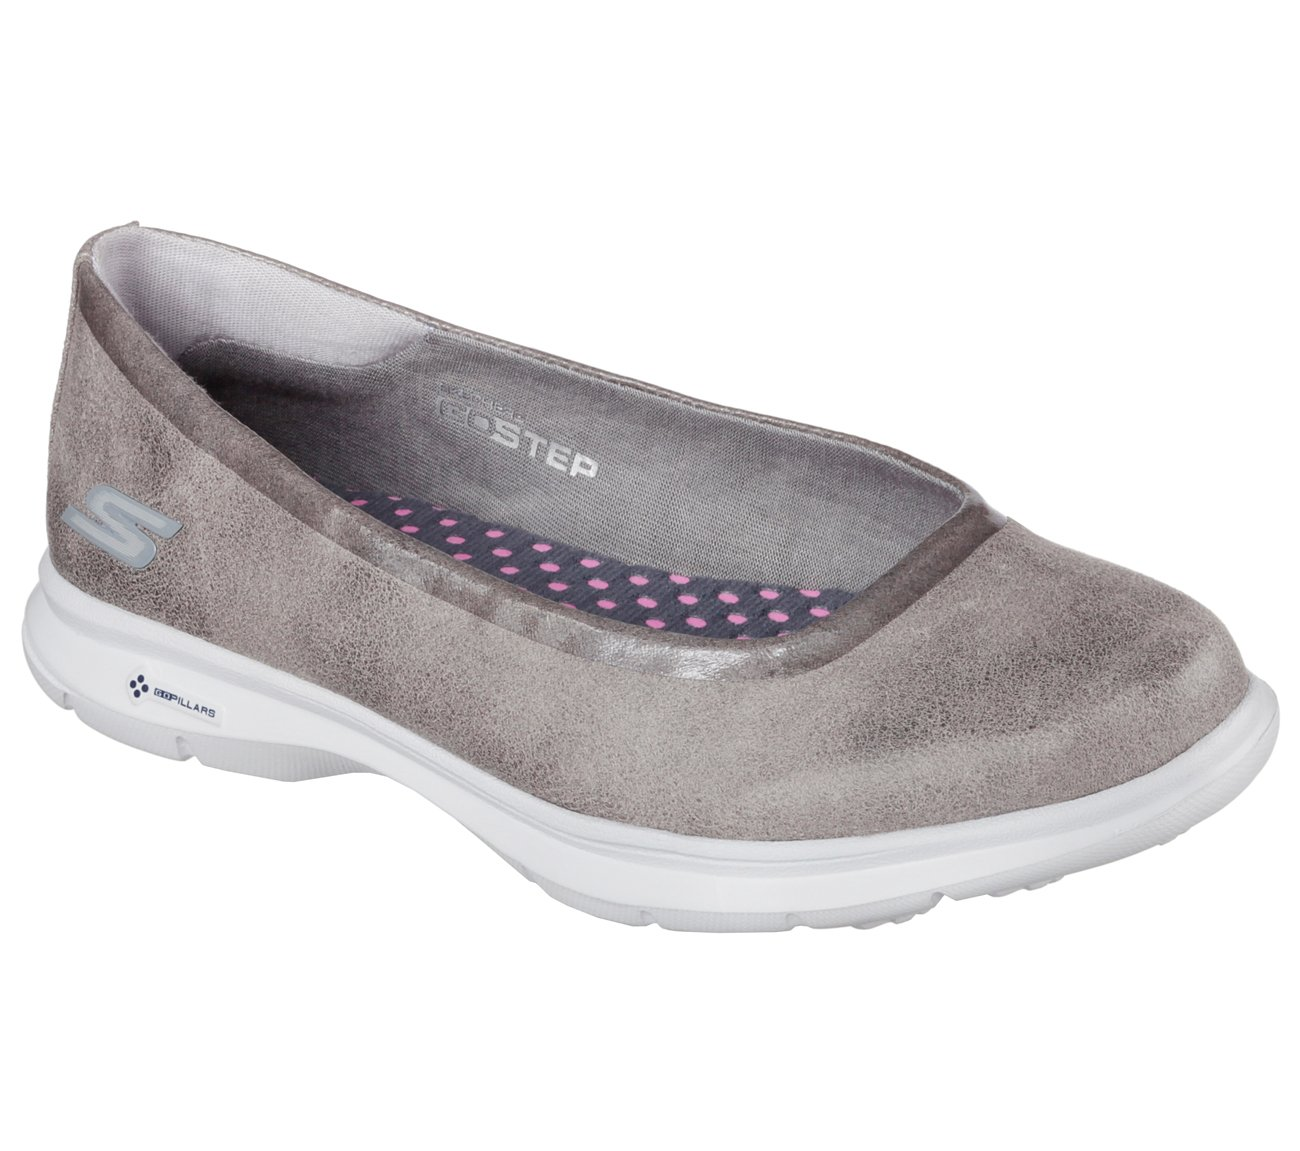 Skechers Go Step Distinguish Womens Slip On Ballet Flat Sneakers Gray 8.5